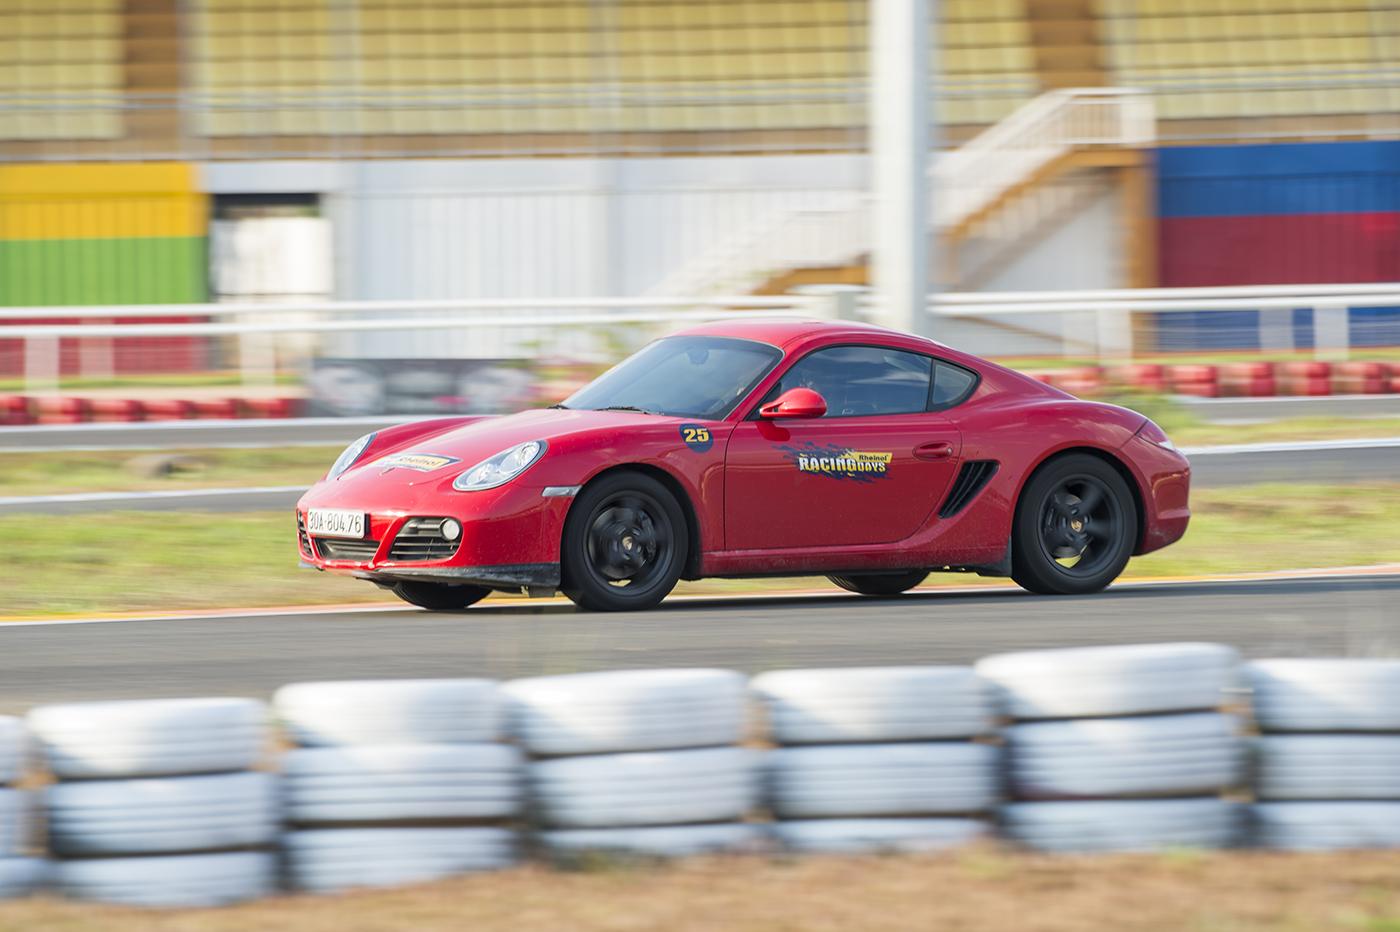 rheinol-racing-days-autodaily-0-69.jpg